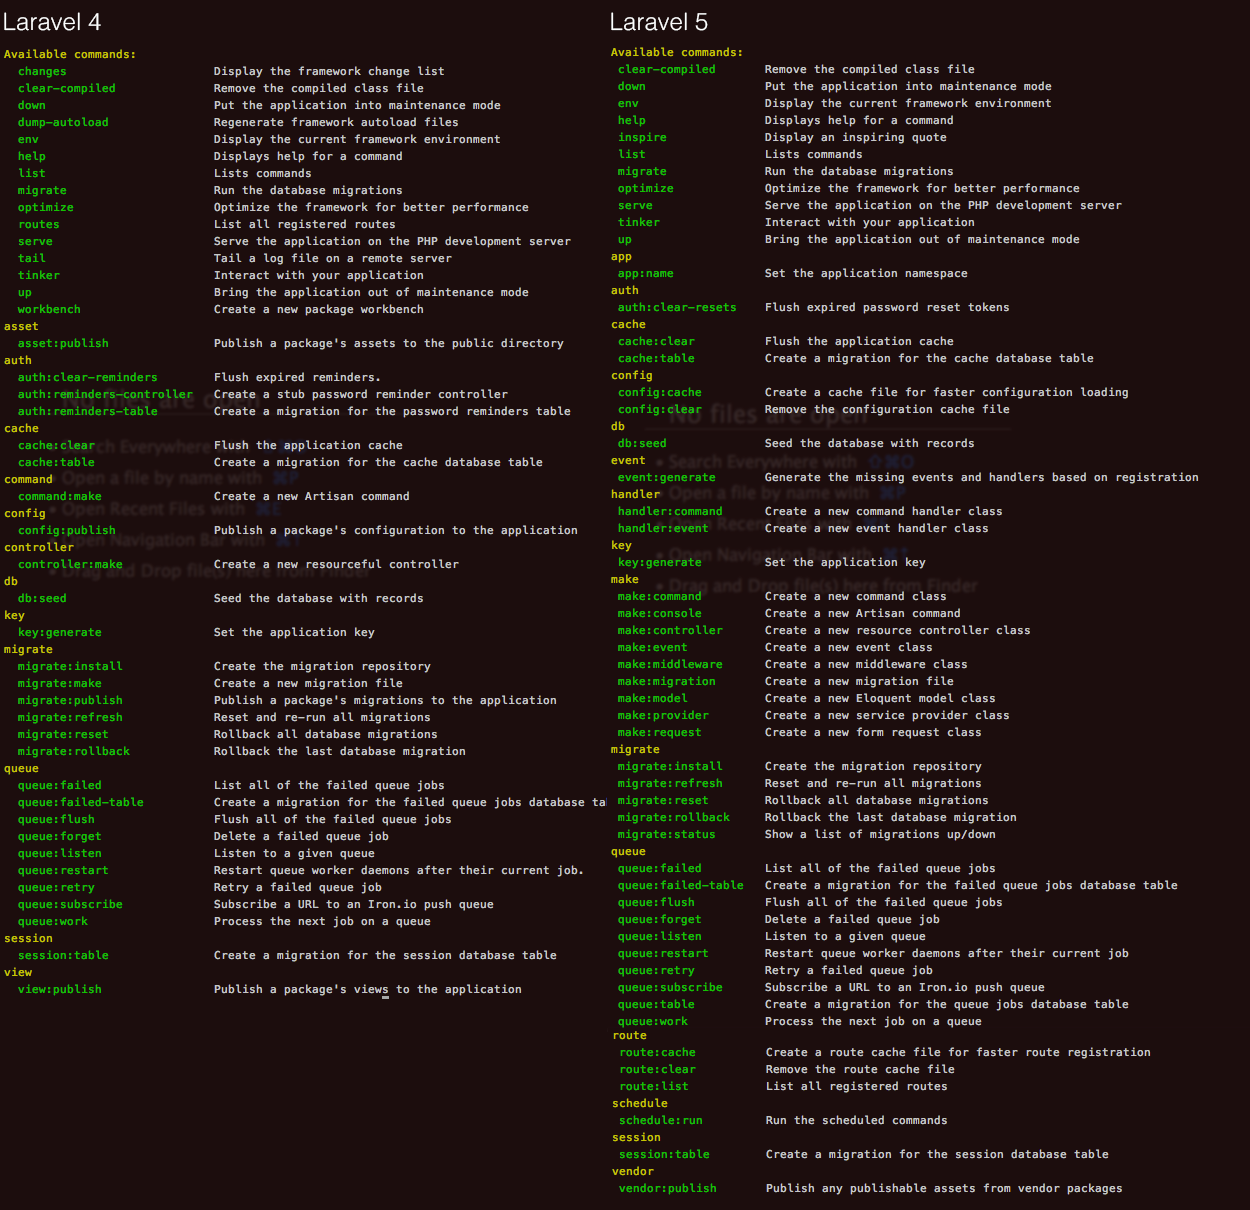 Koomai - Comparison of Artisan in Laravel 4 and 5